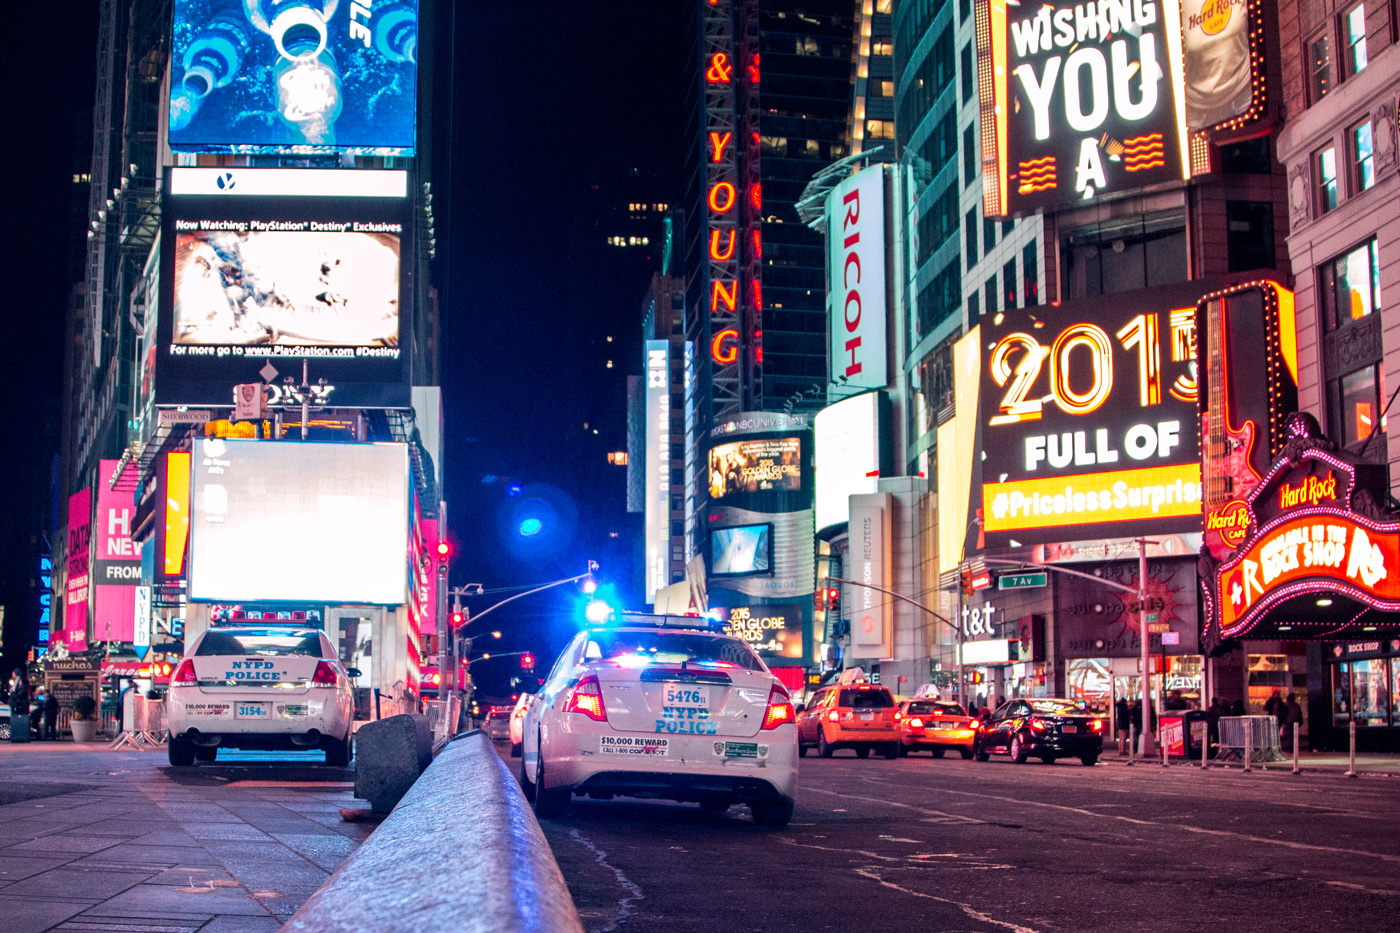 Plenty of police presence throughout NY